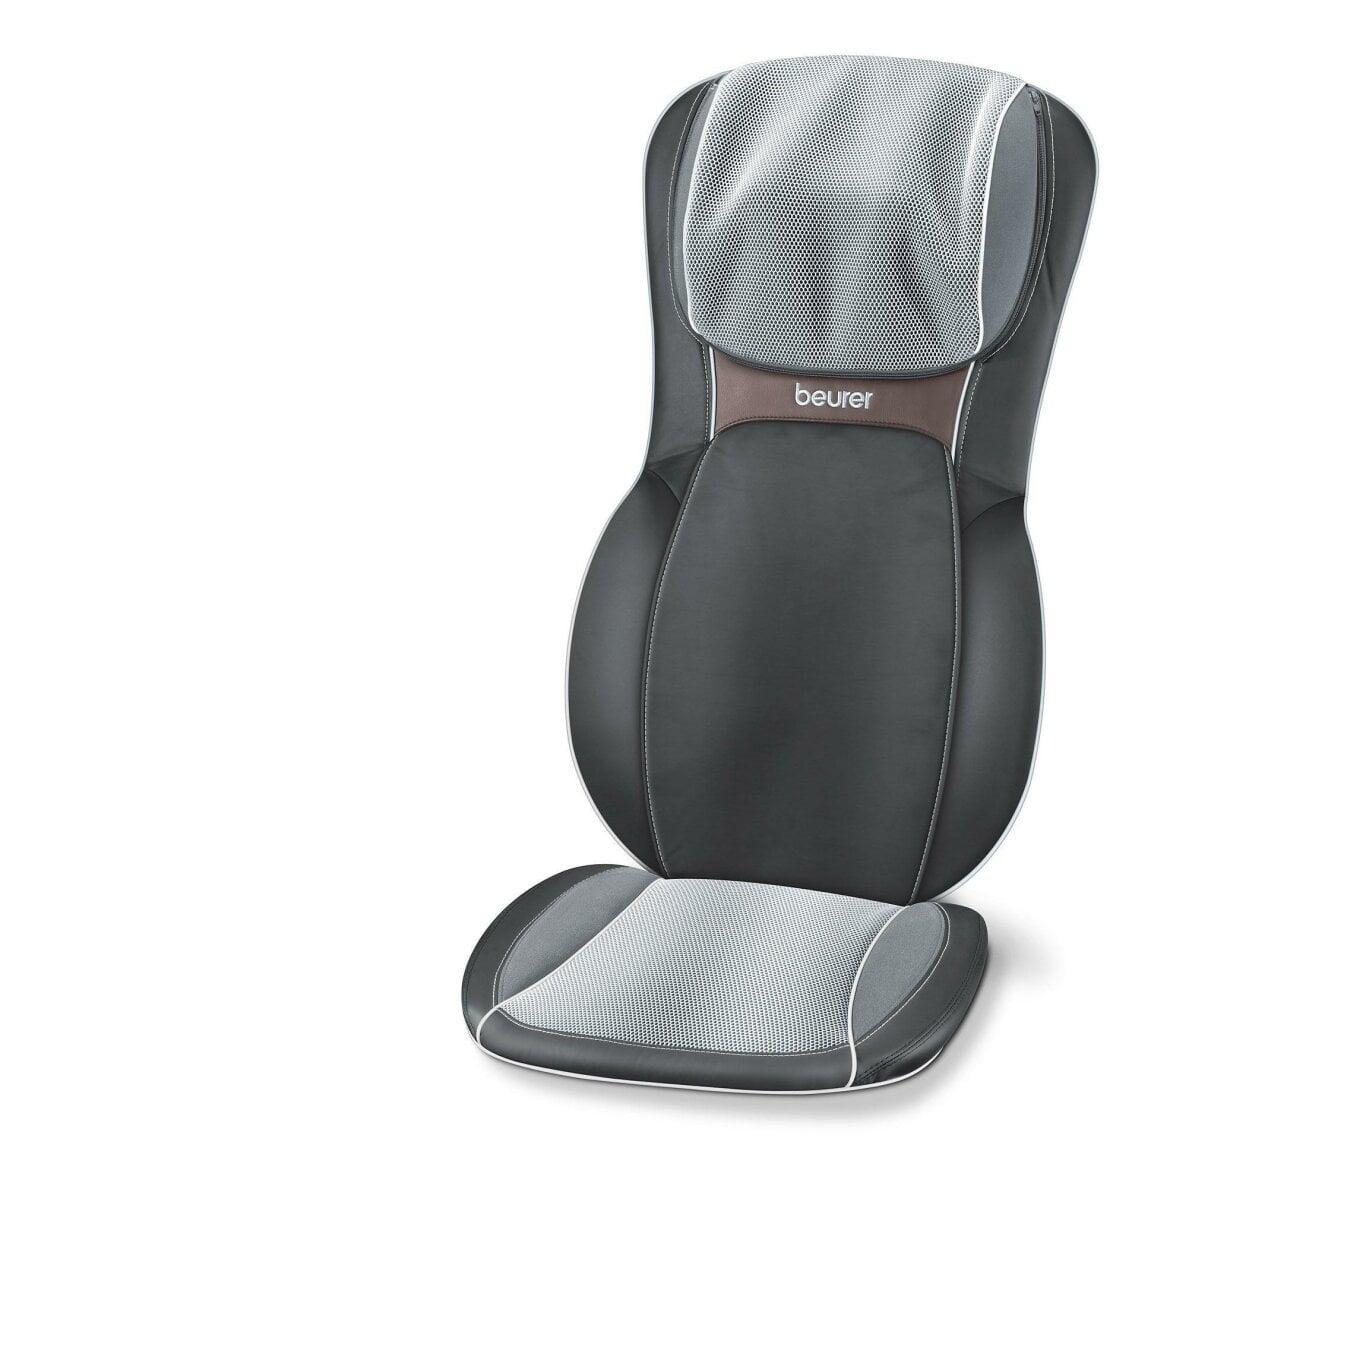 Beurer Shiatsu-Sitzauflage - MG 295 - HD 3D black